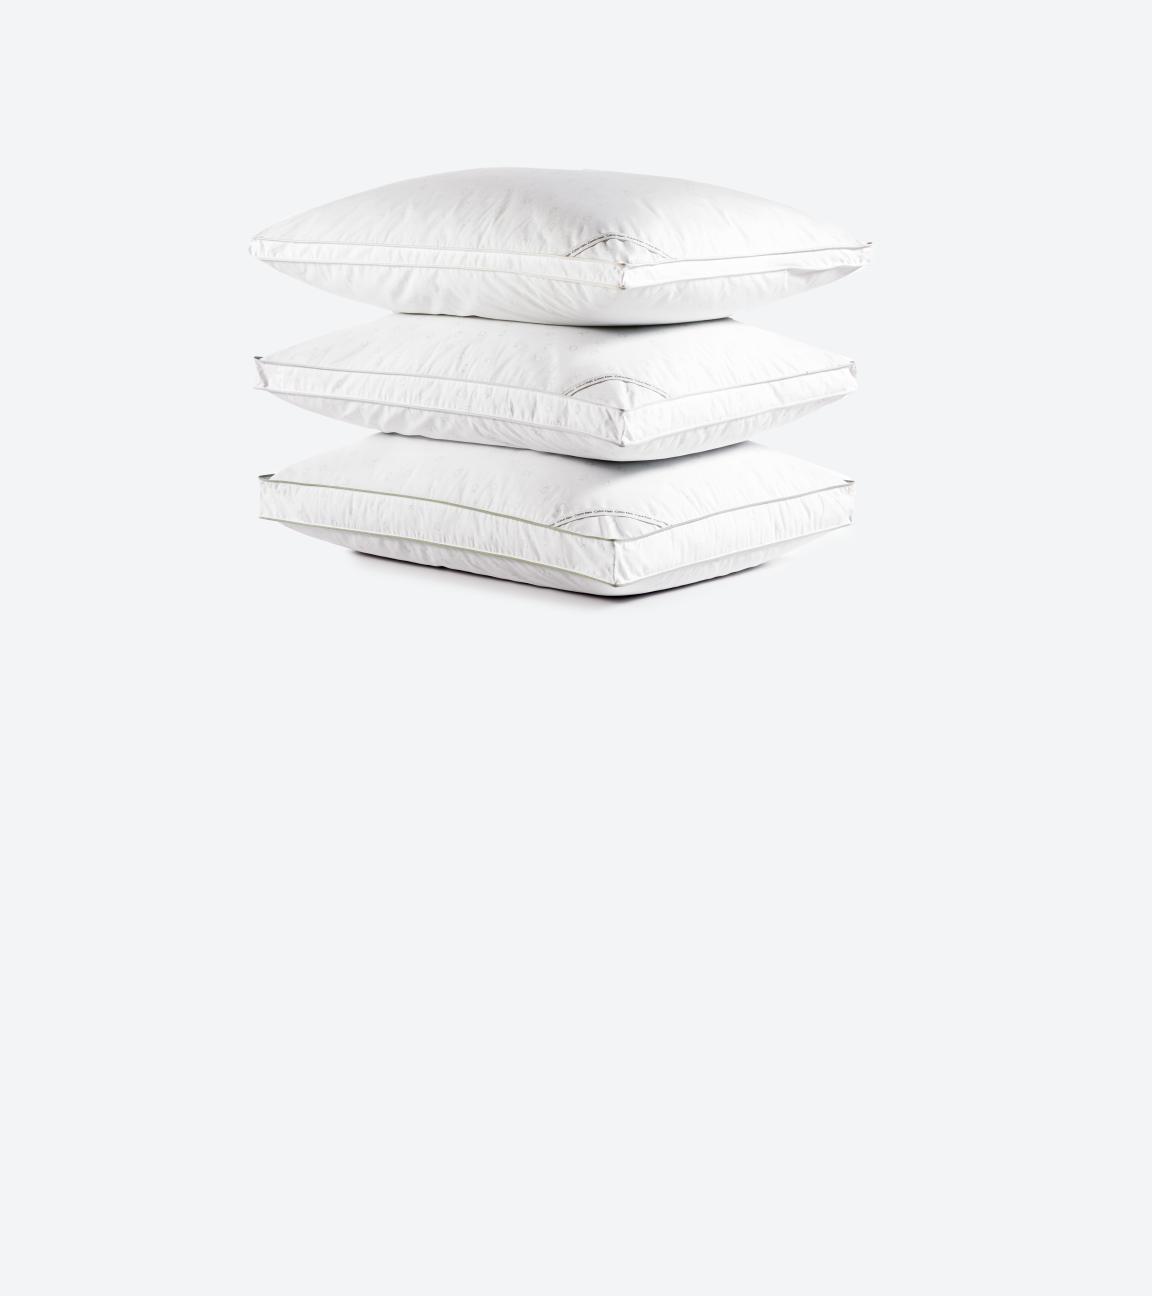 Macy's: $6.99 Designer Pillows from Lauren Ralph Lauren, Calvin Klein, and Tommy Hilfiger